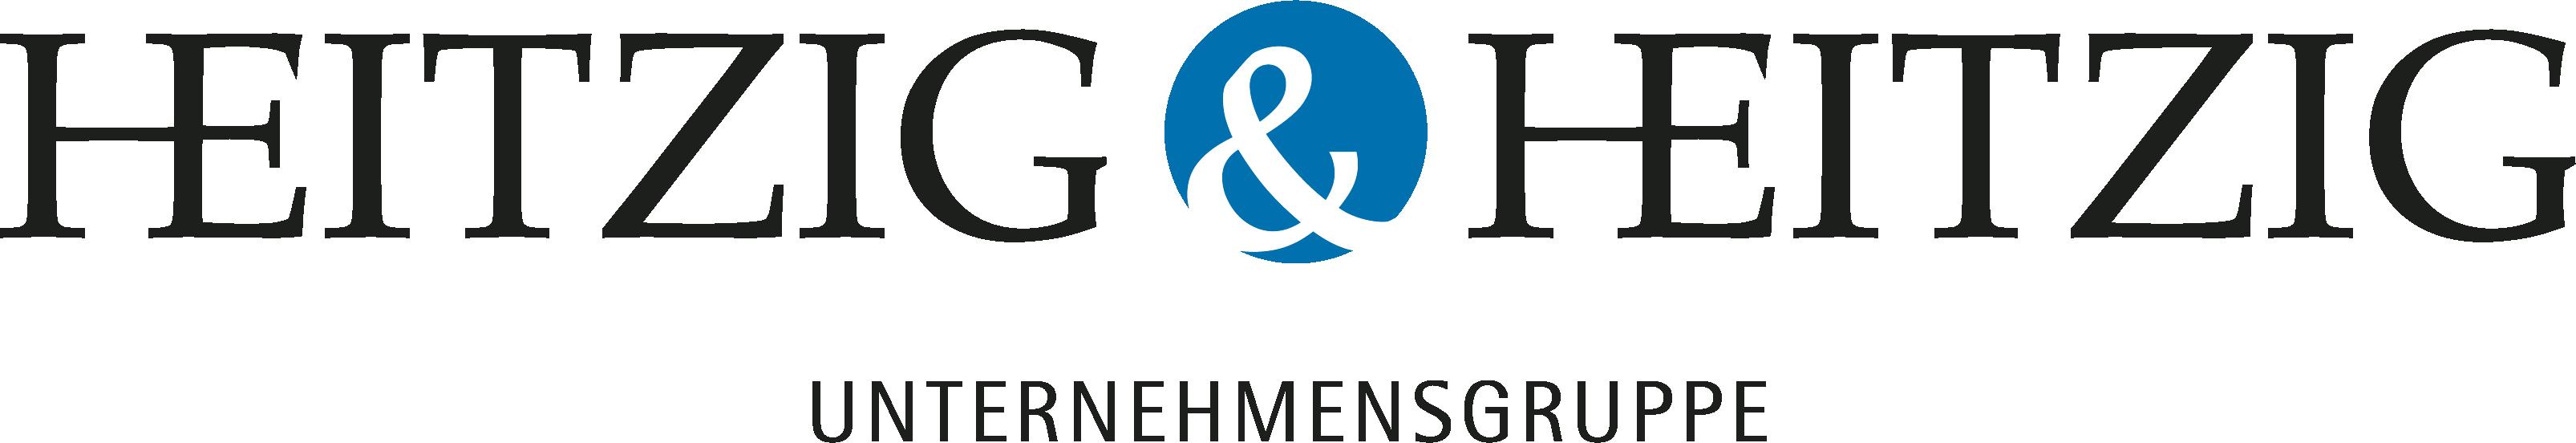 HH_Unternehmensgruppe